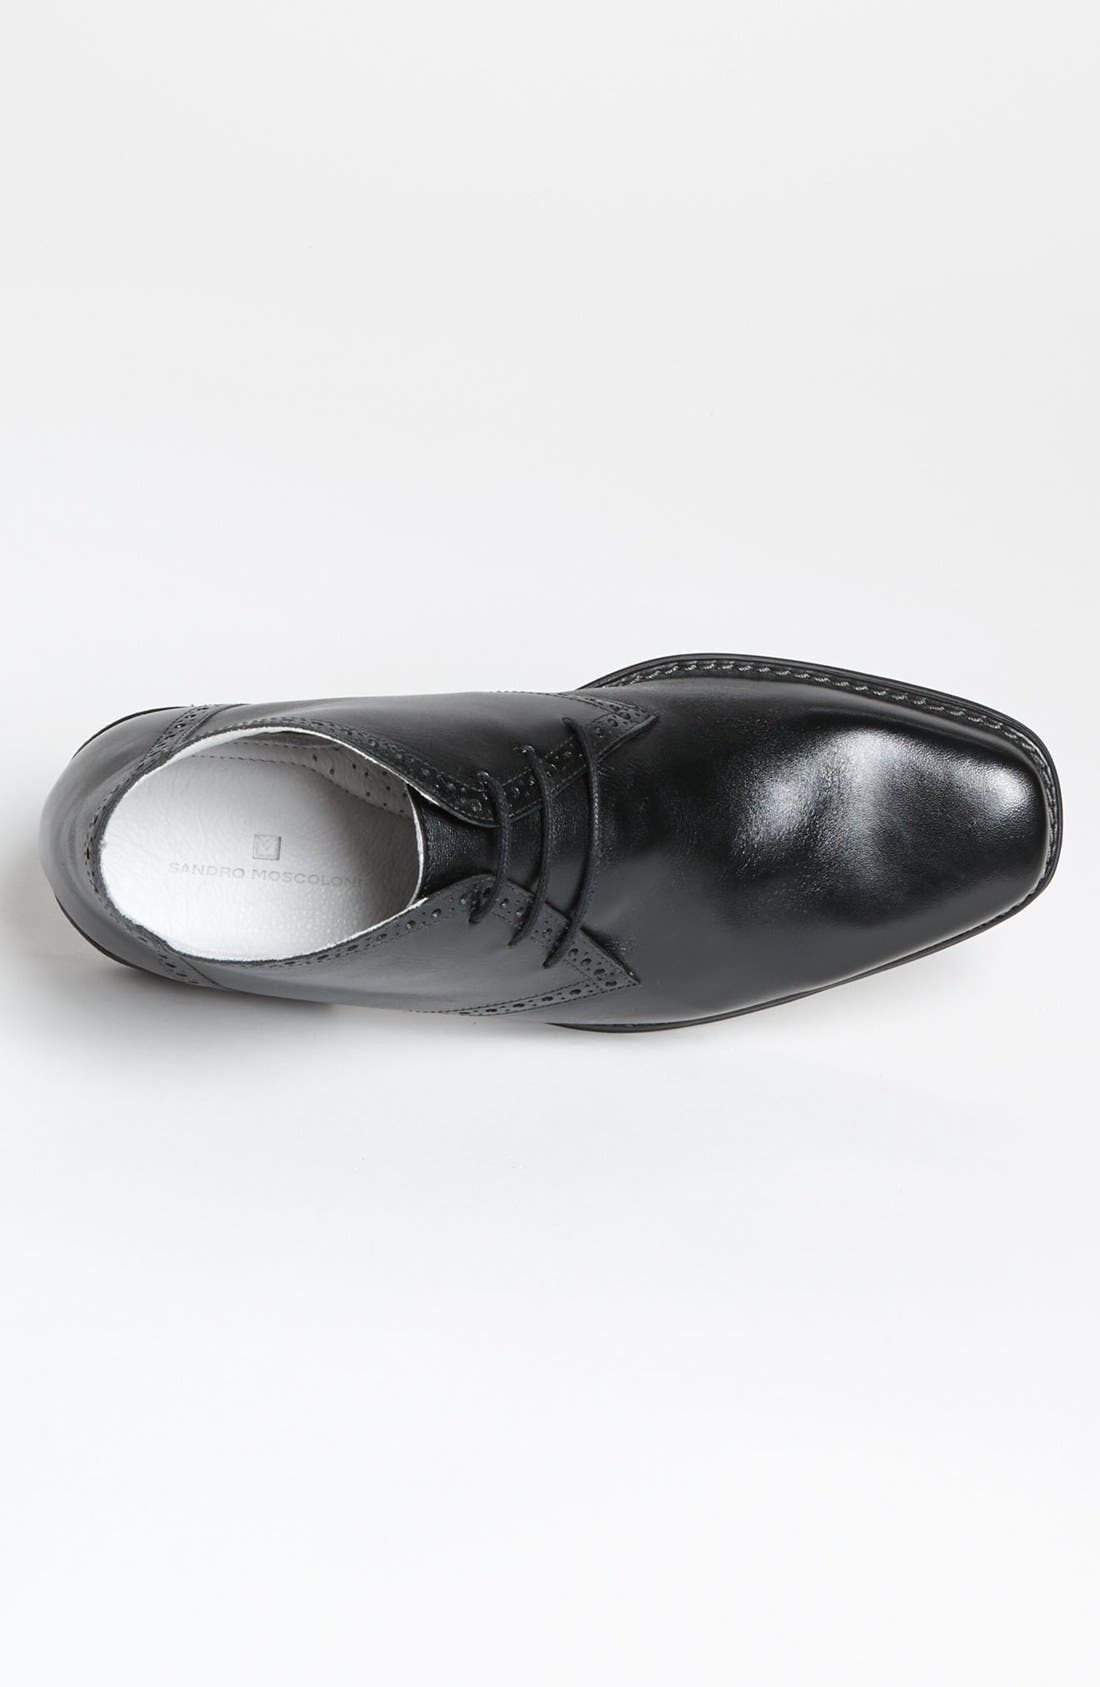 Alternate Image 3  - Sandro Moscoloni 'Grant' Chukka Boot